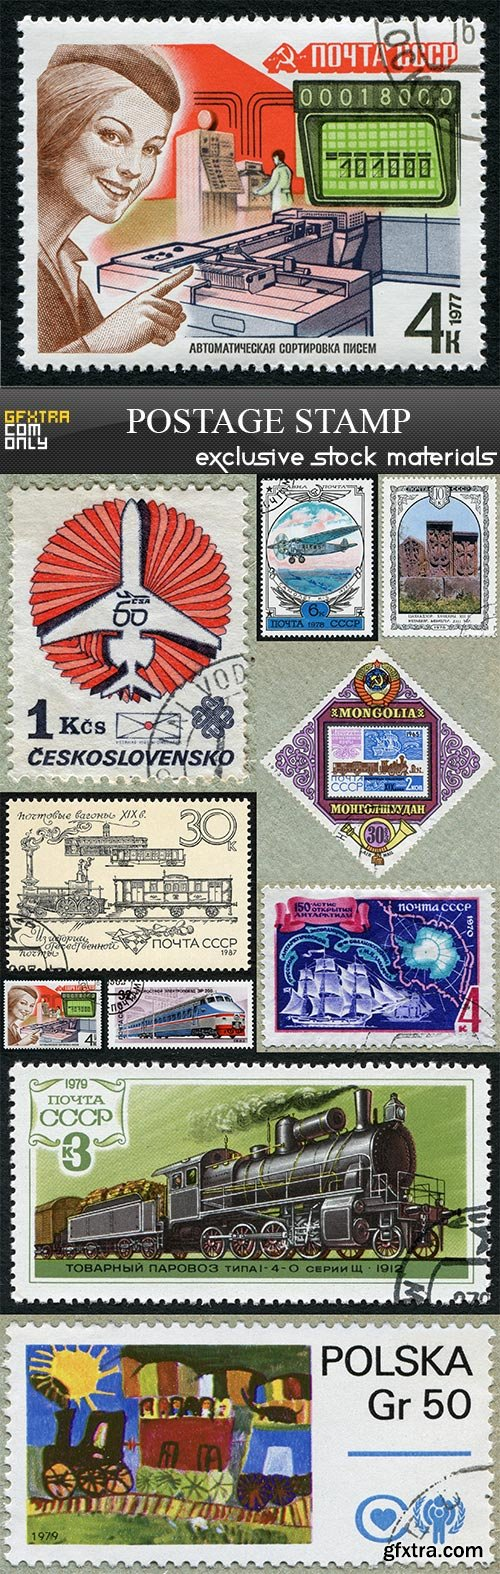 Postage stamp, 10 x UHQ JPEG